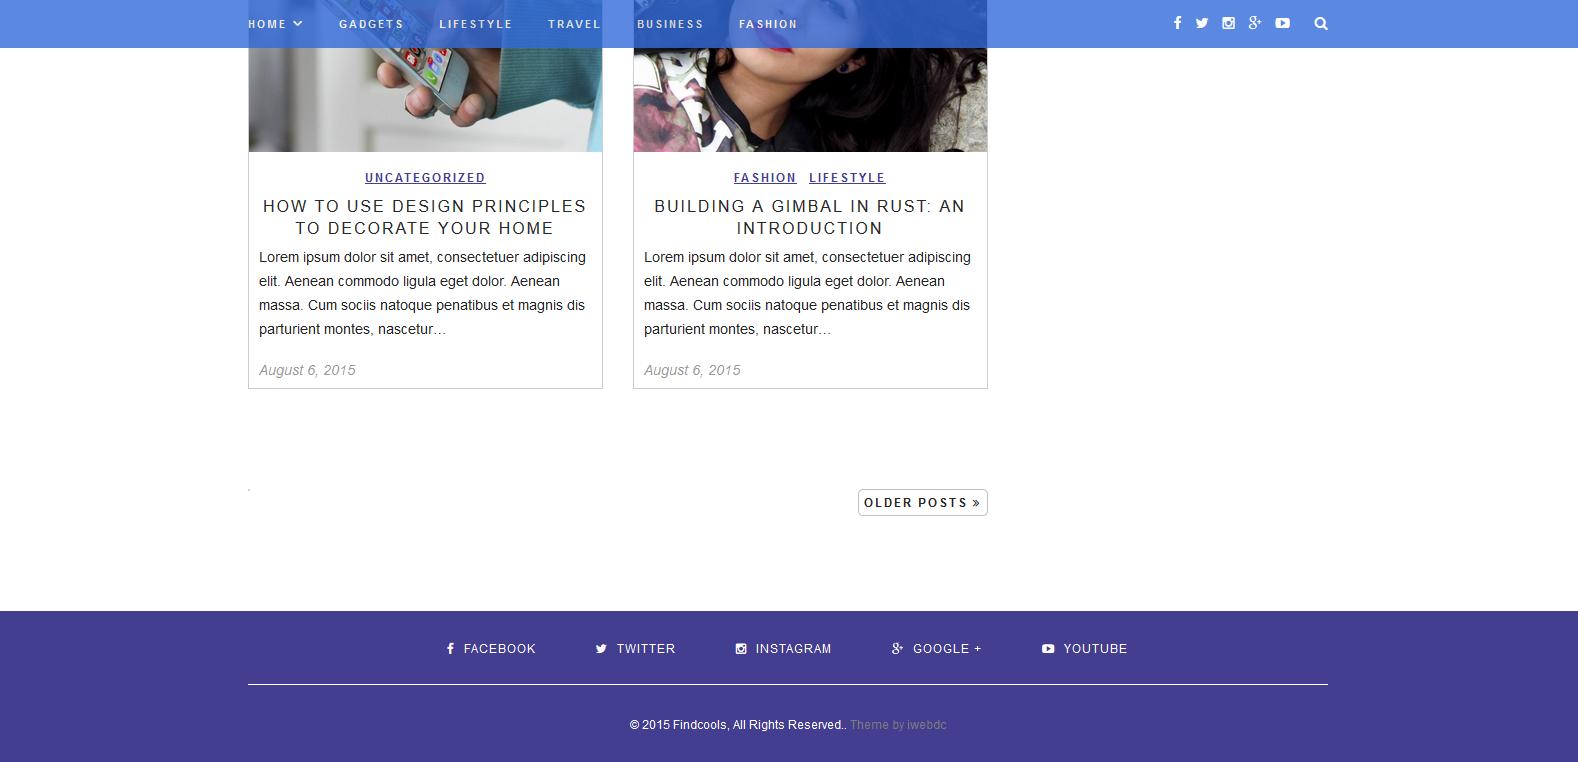 WordPress数码主题:Findcools